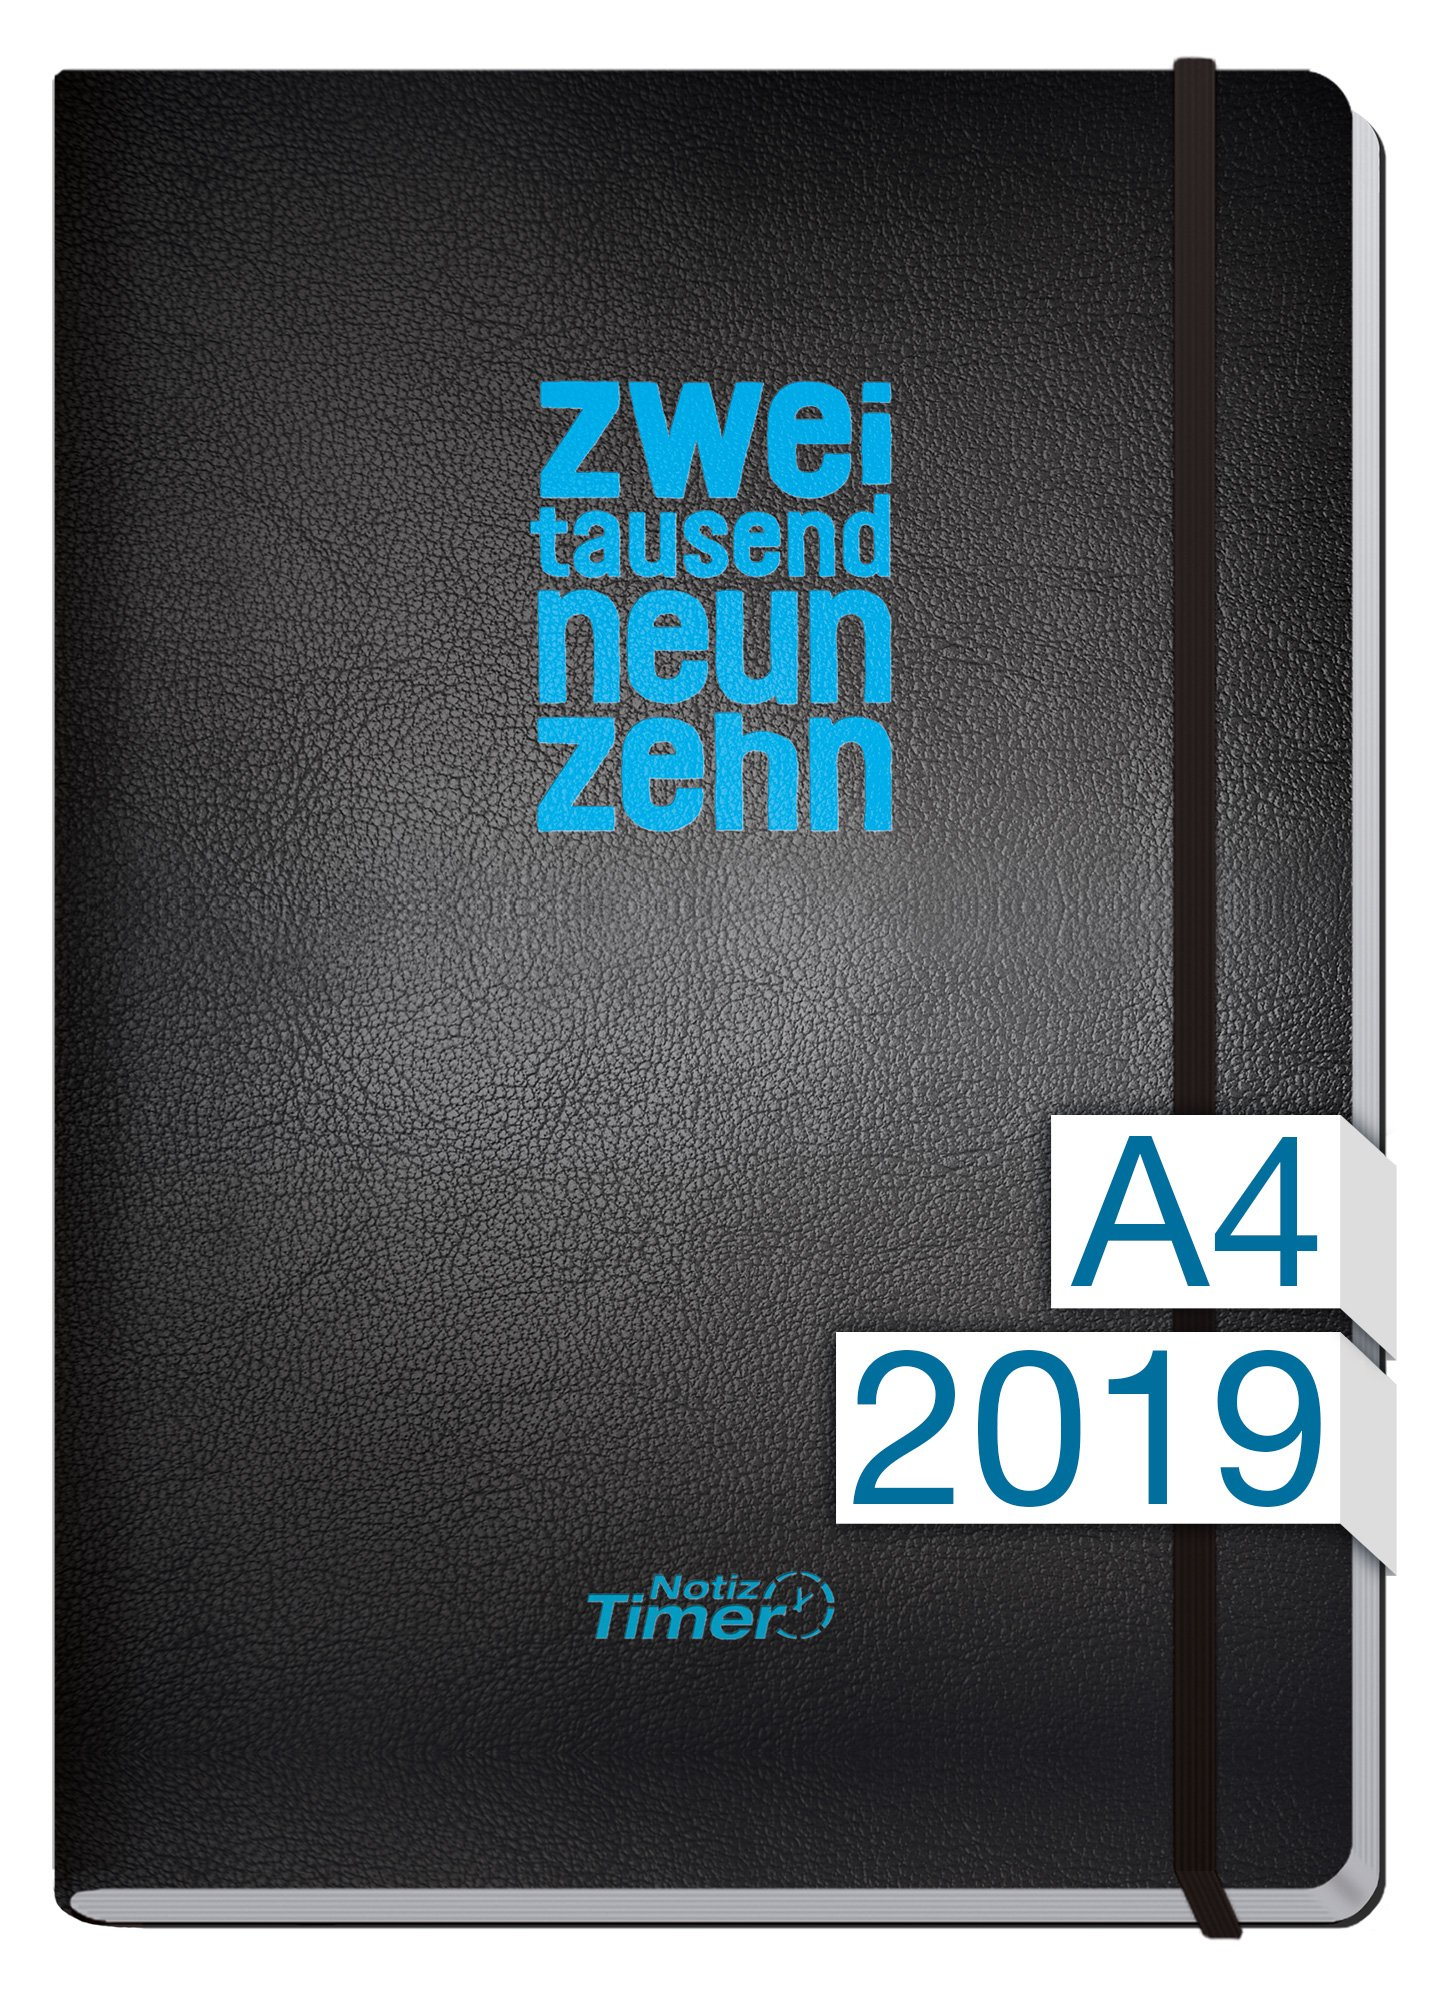 Chäff Wochen-Notizkalender Classic Kalender 2019 A4 Maxi - Extra-Groß Jan-Dez 2019 - Notiz-Timer - Terminplaner - Wochenkalender - Organizer - Terminkalender mit Wochenplaner - Soft-Cover